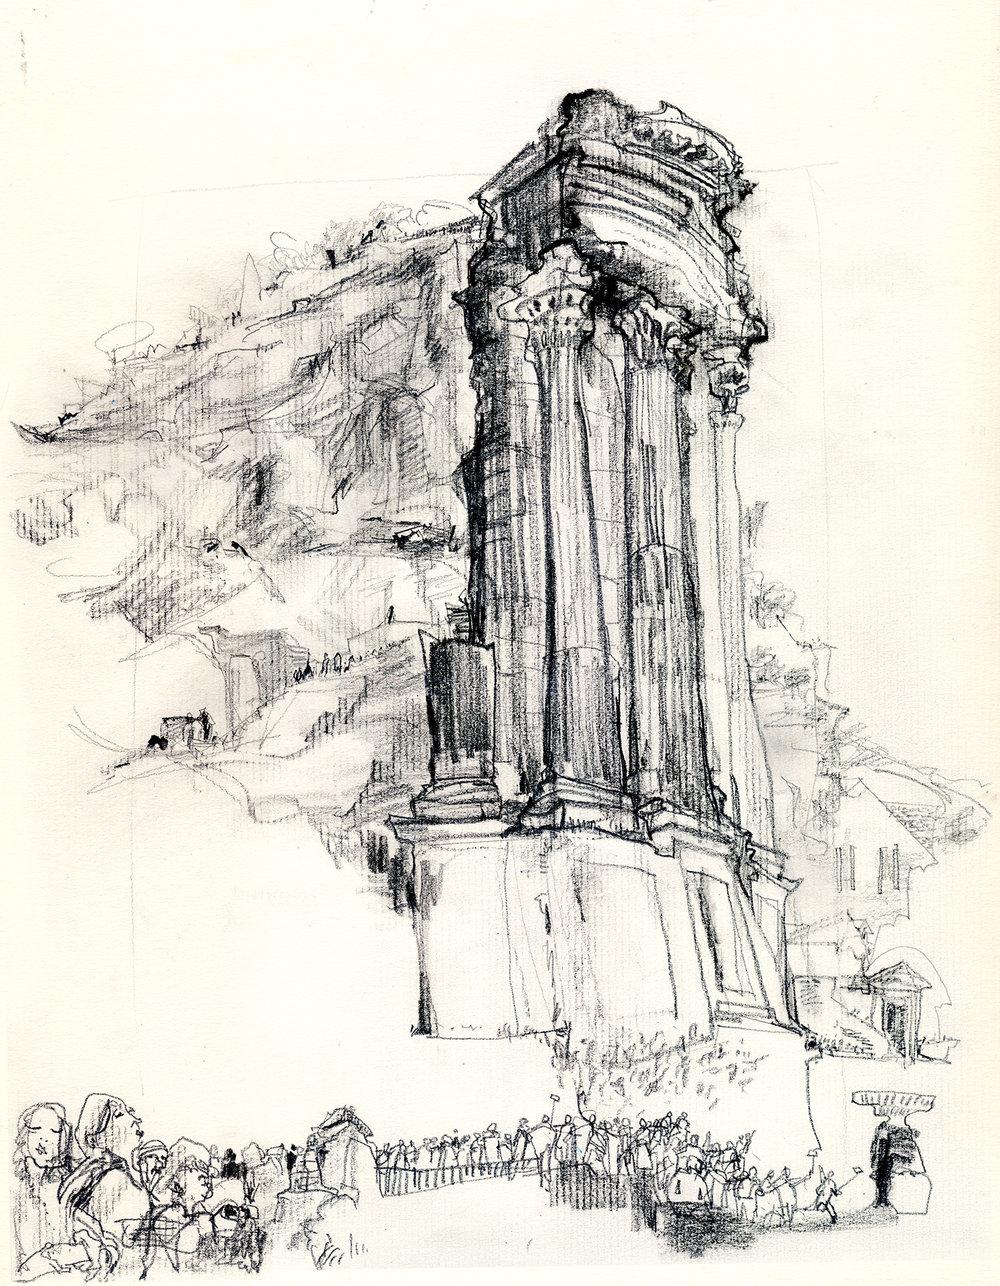 Temple of Vesta, Roman Forum